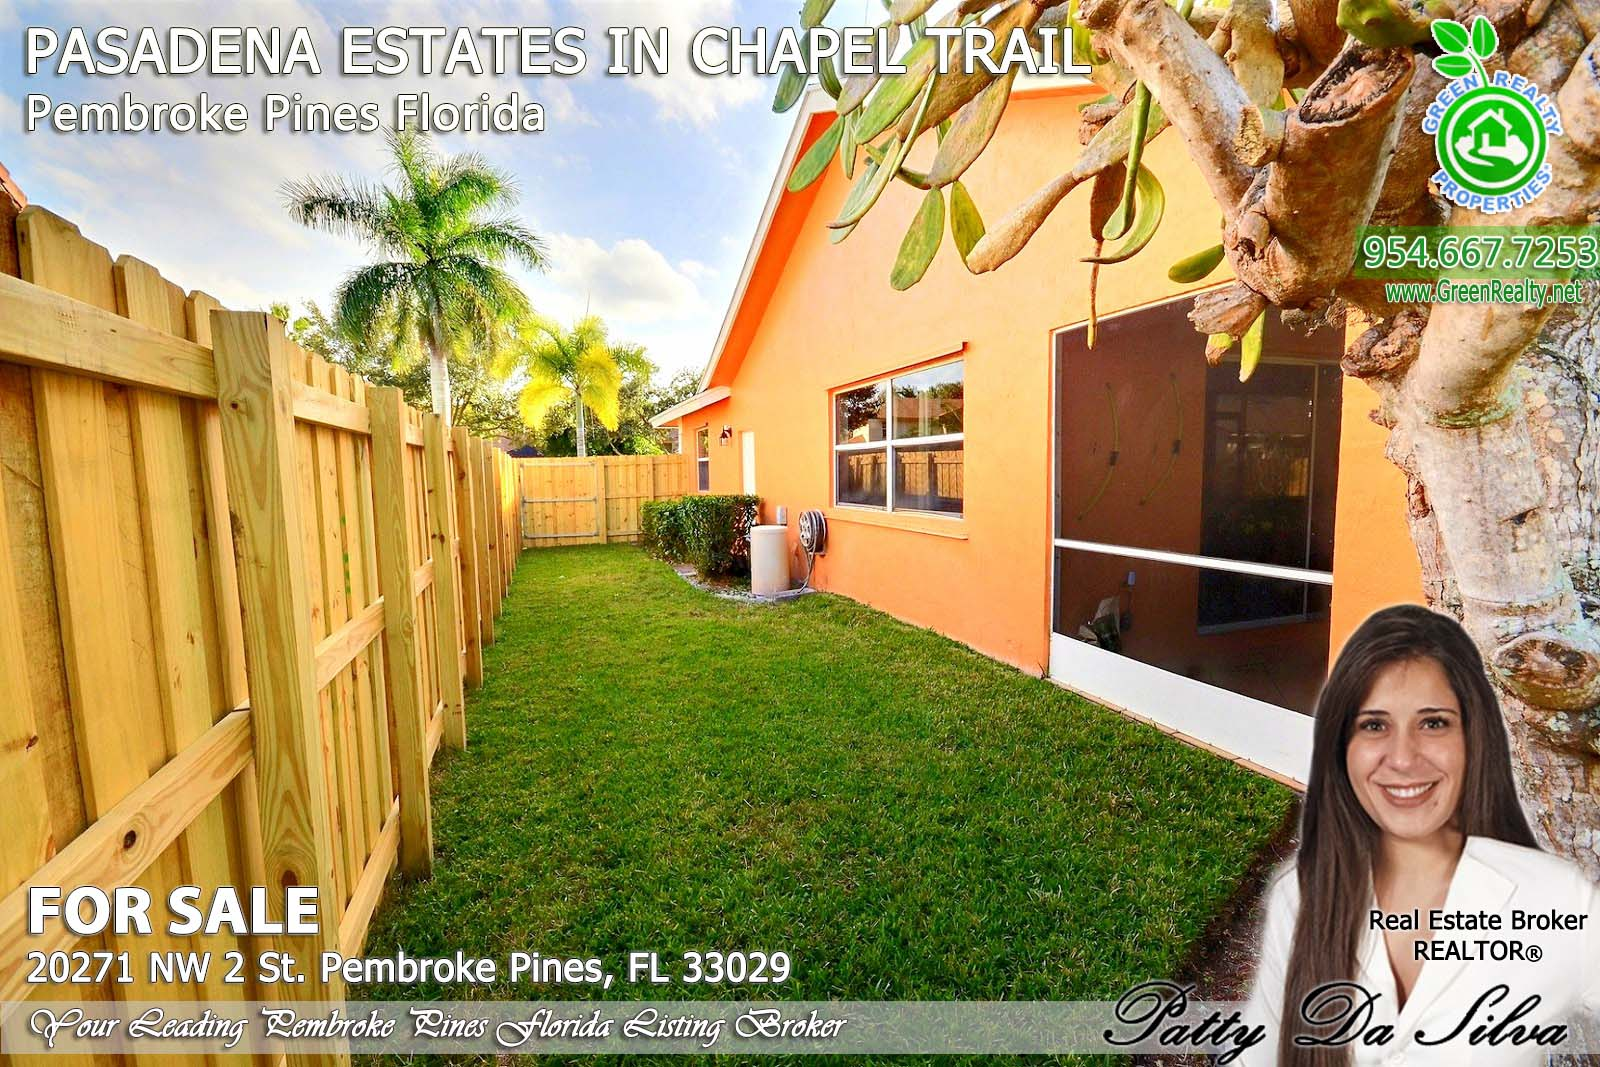 Pasadena Estates of Chapel Trail - Pembroke Pines FL homes for sale